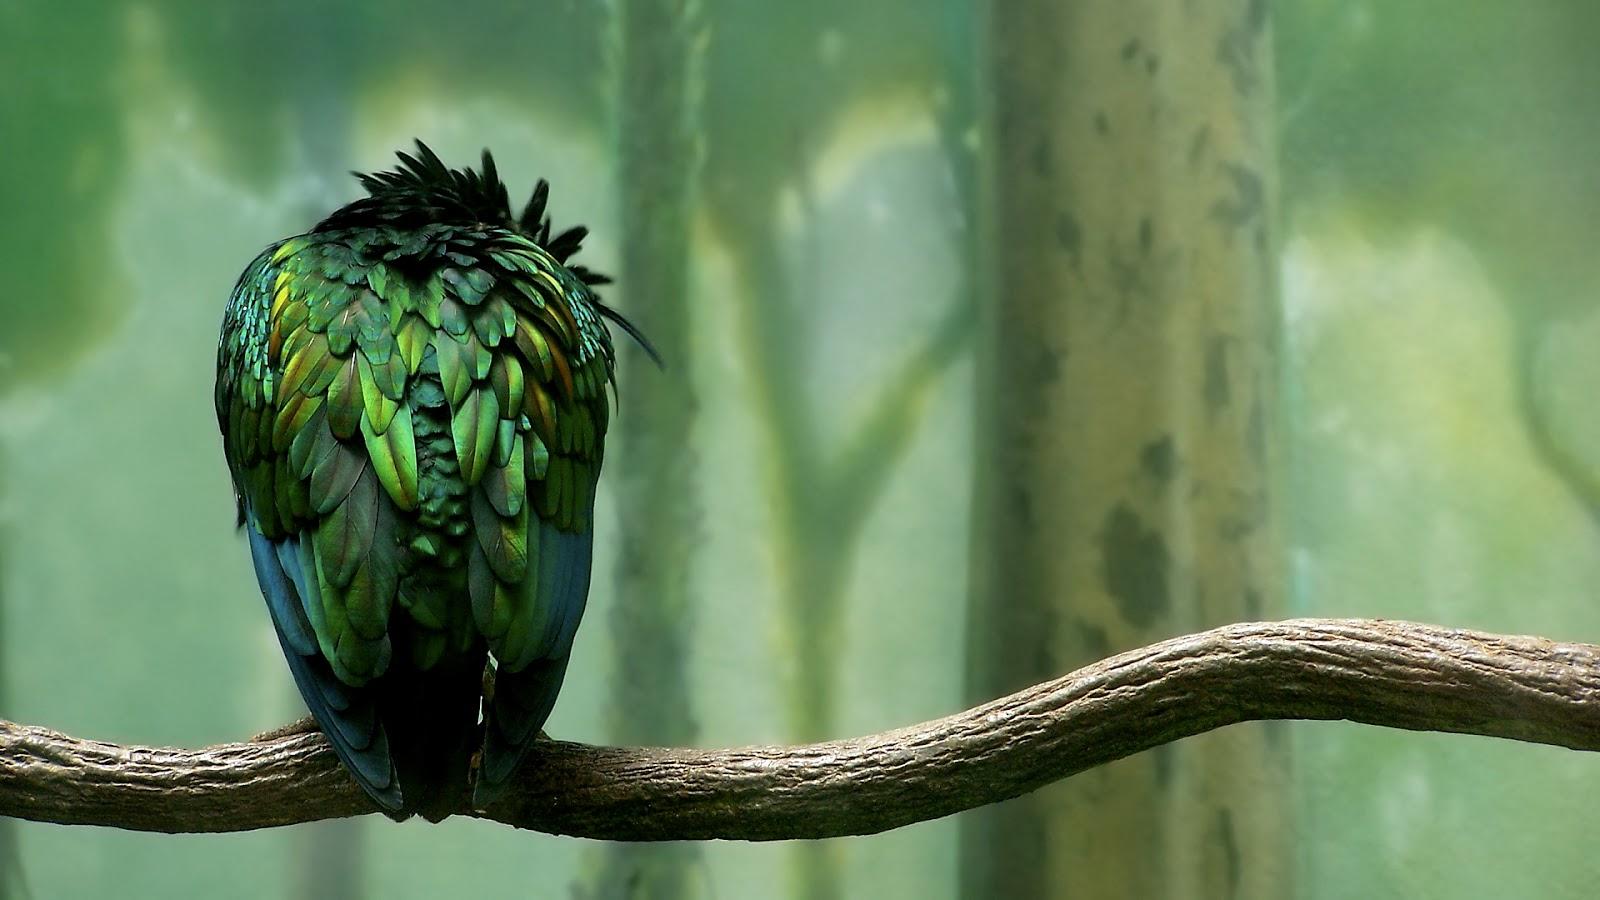 Bird Wallpaper Sitting on a Tree Brand HD 1080p